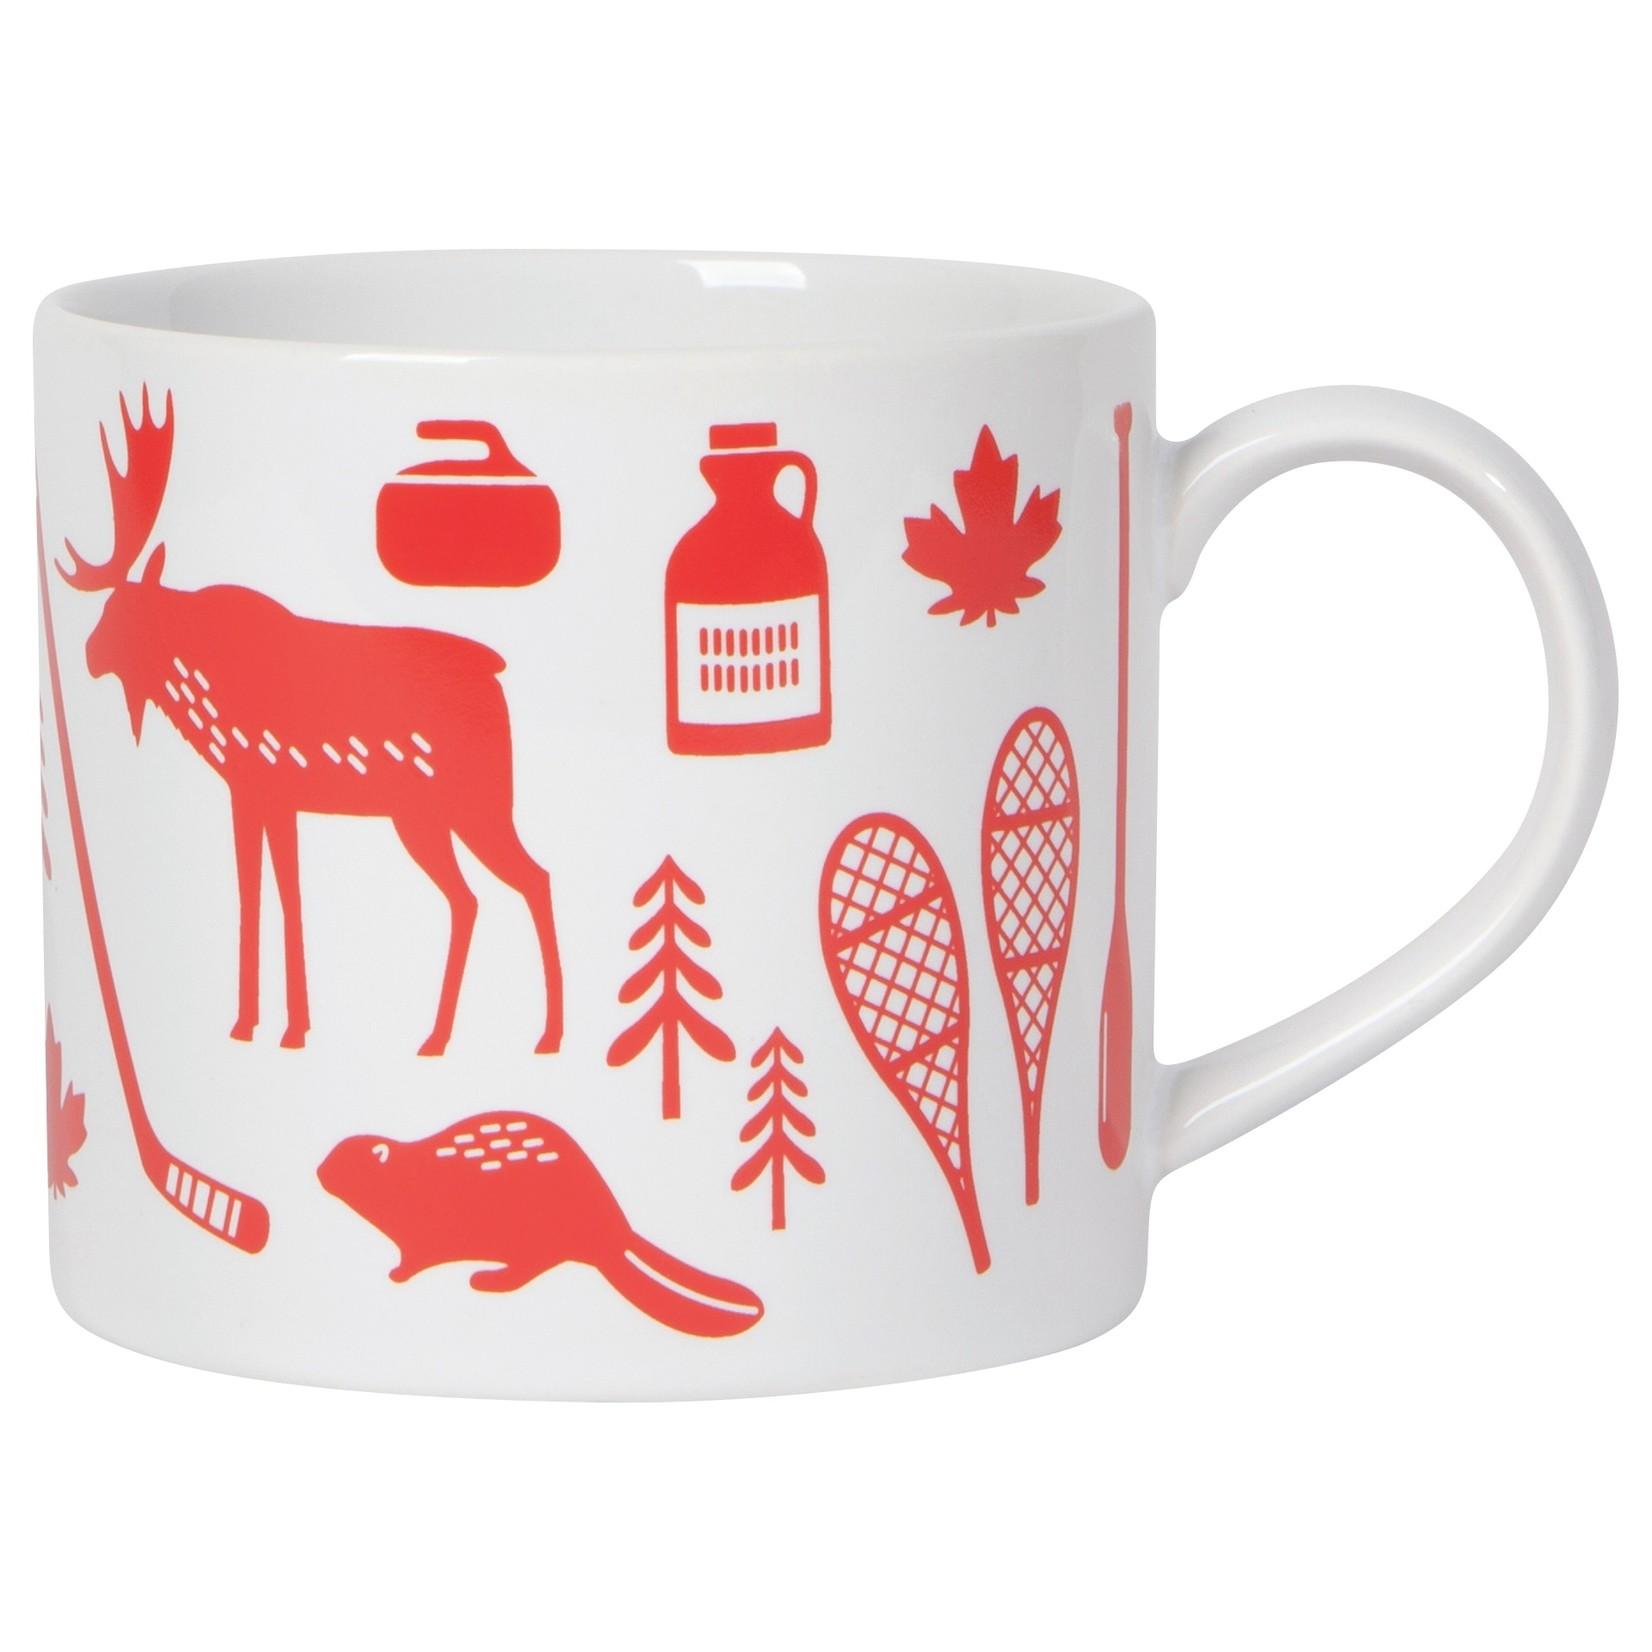 Now Designs Mug in a Box